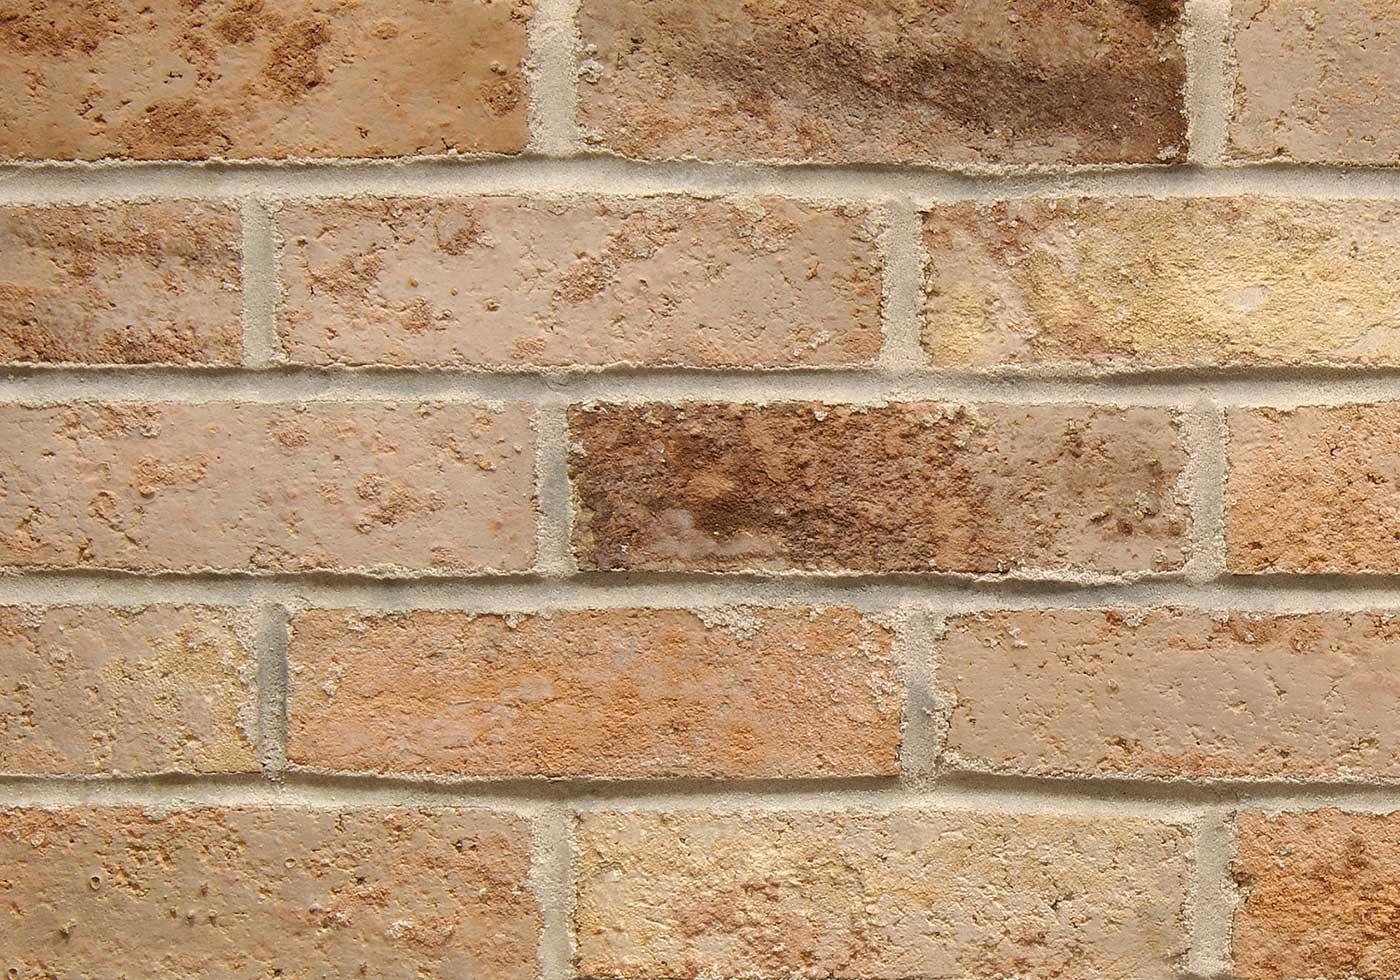 Rhodes brick close-up